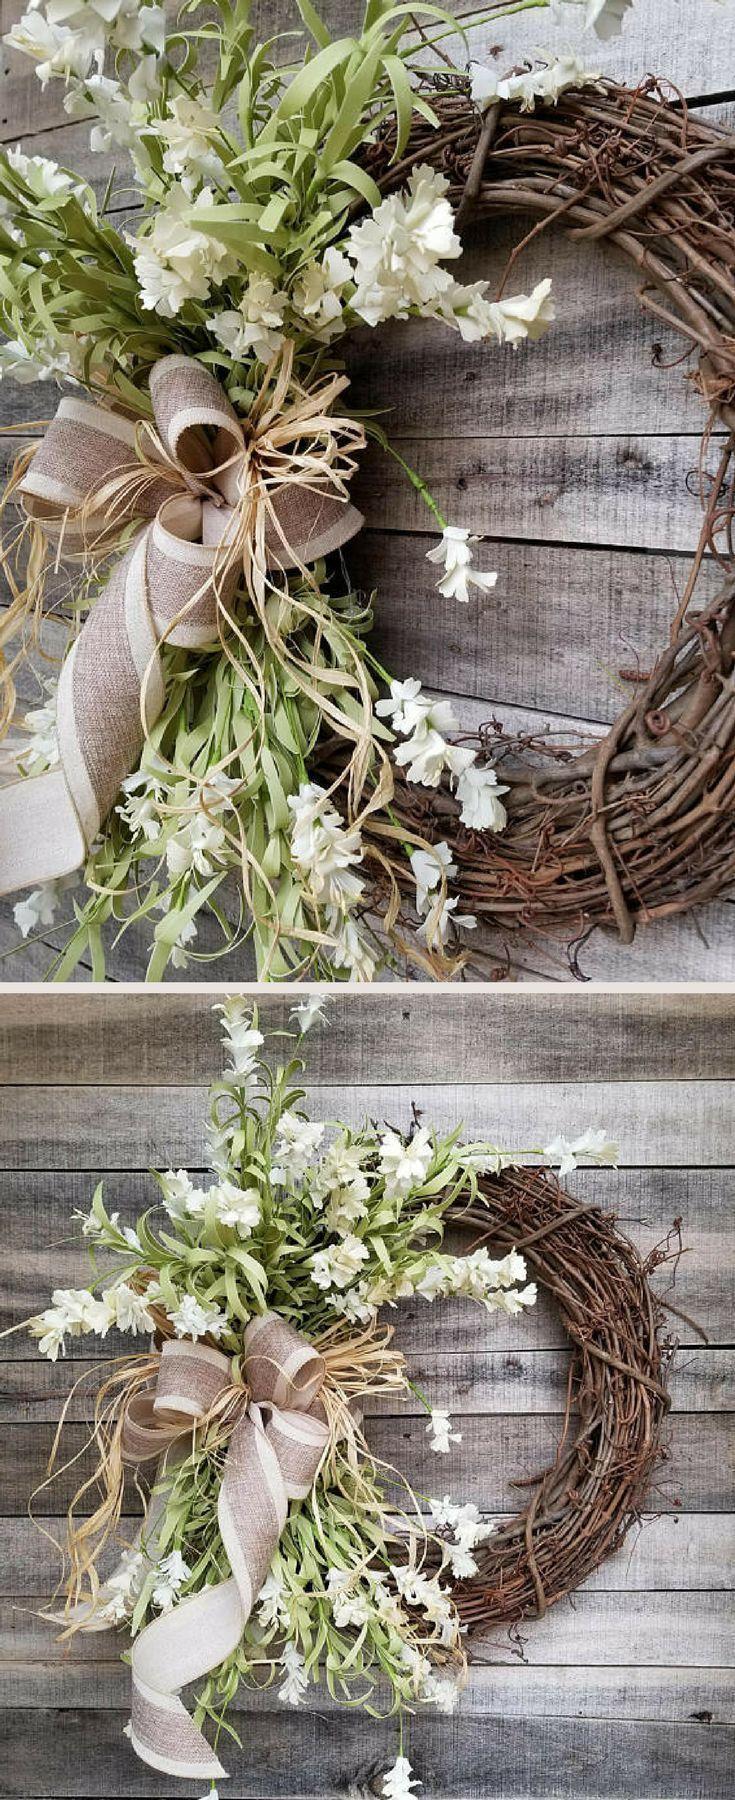 22 Front Door Wreaths Summer Wreaths Home Decor Wreaths Wreath